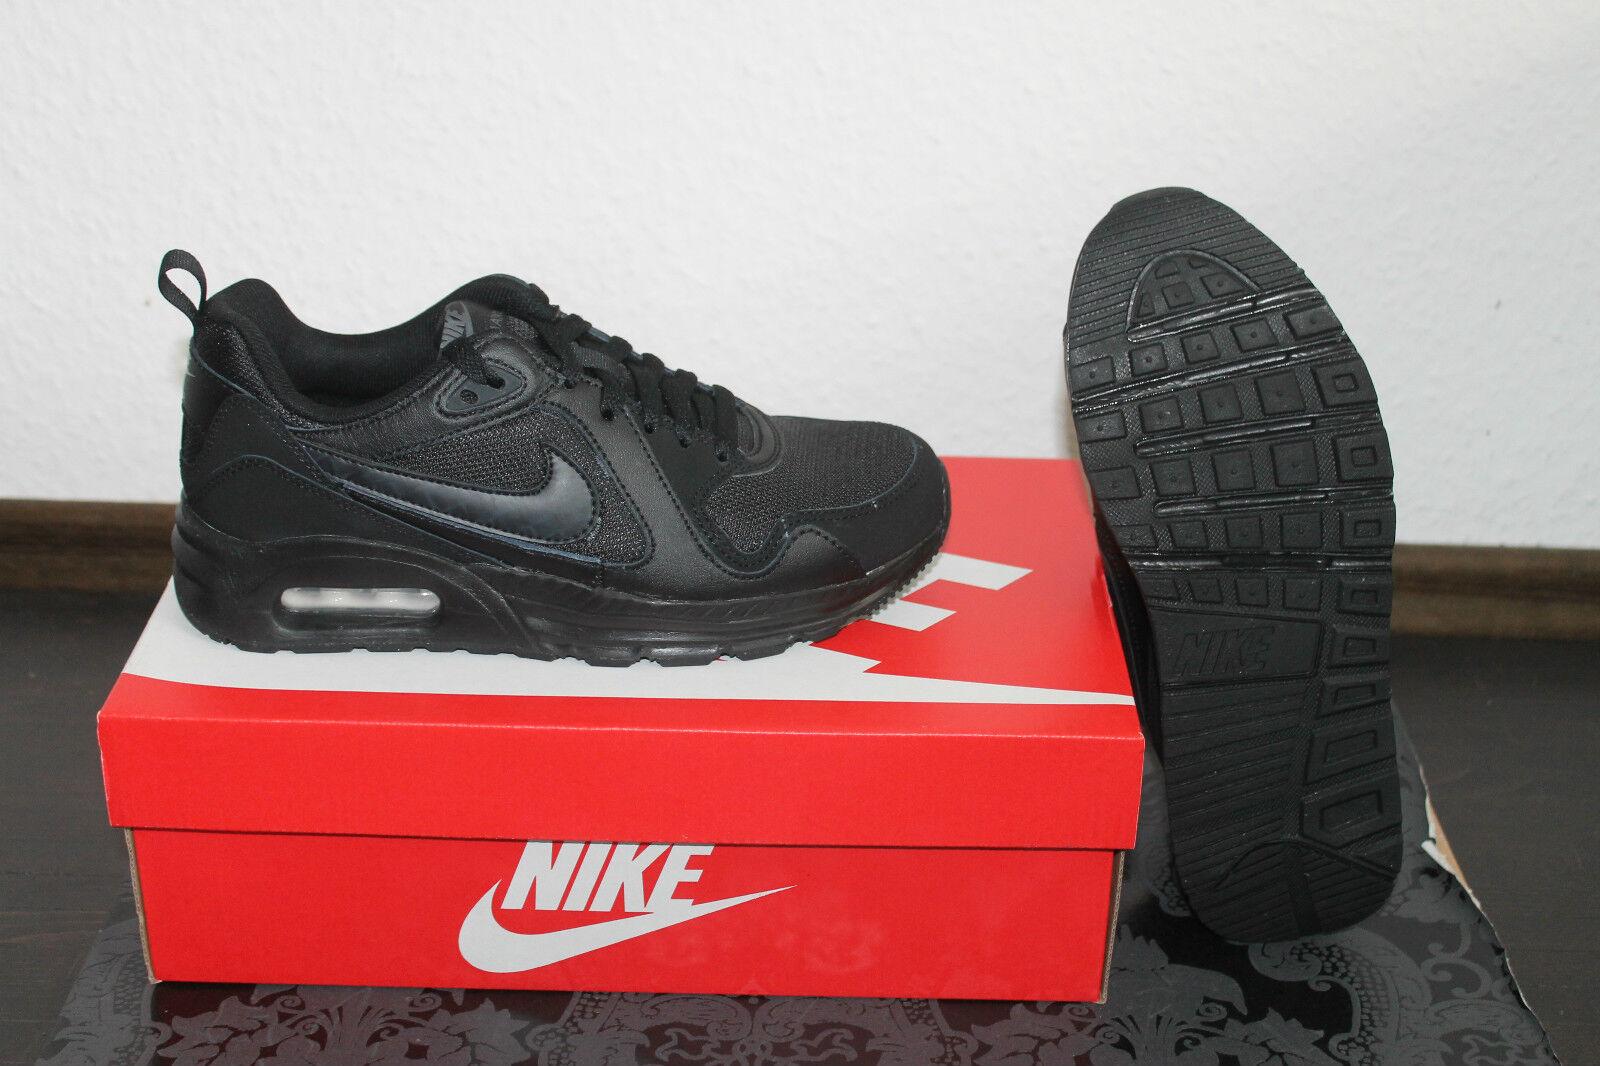 Nike Air Max Trax Femmes Chaussures de course noir gris taille 36,5 ; 38 ou 38,5